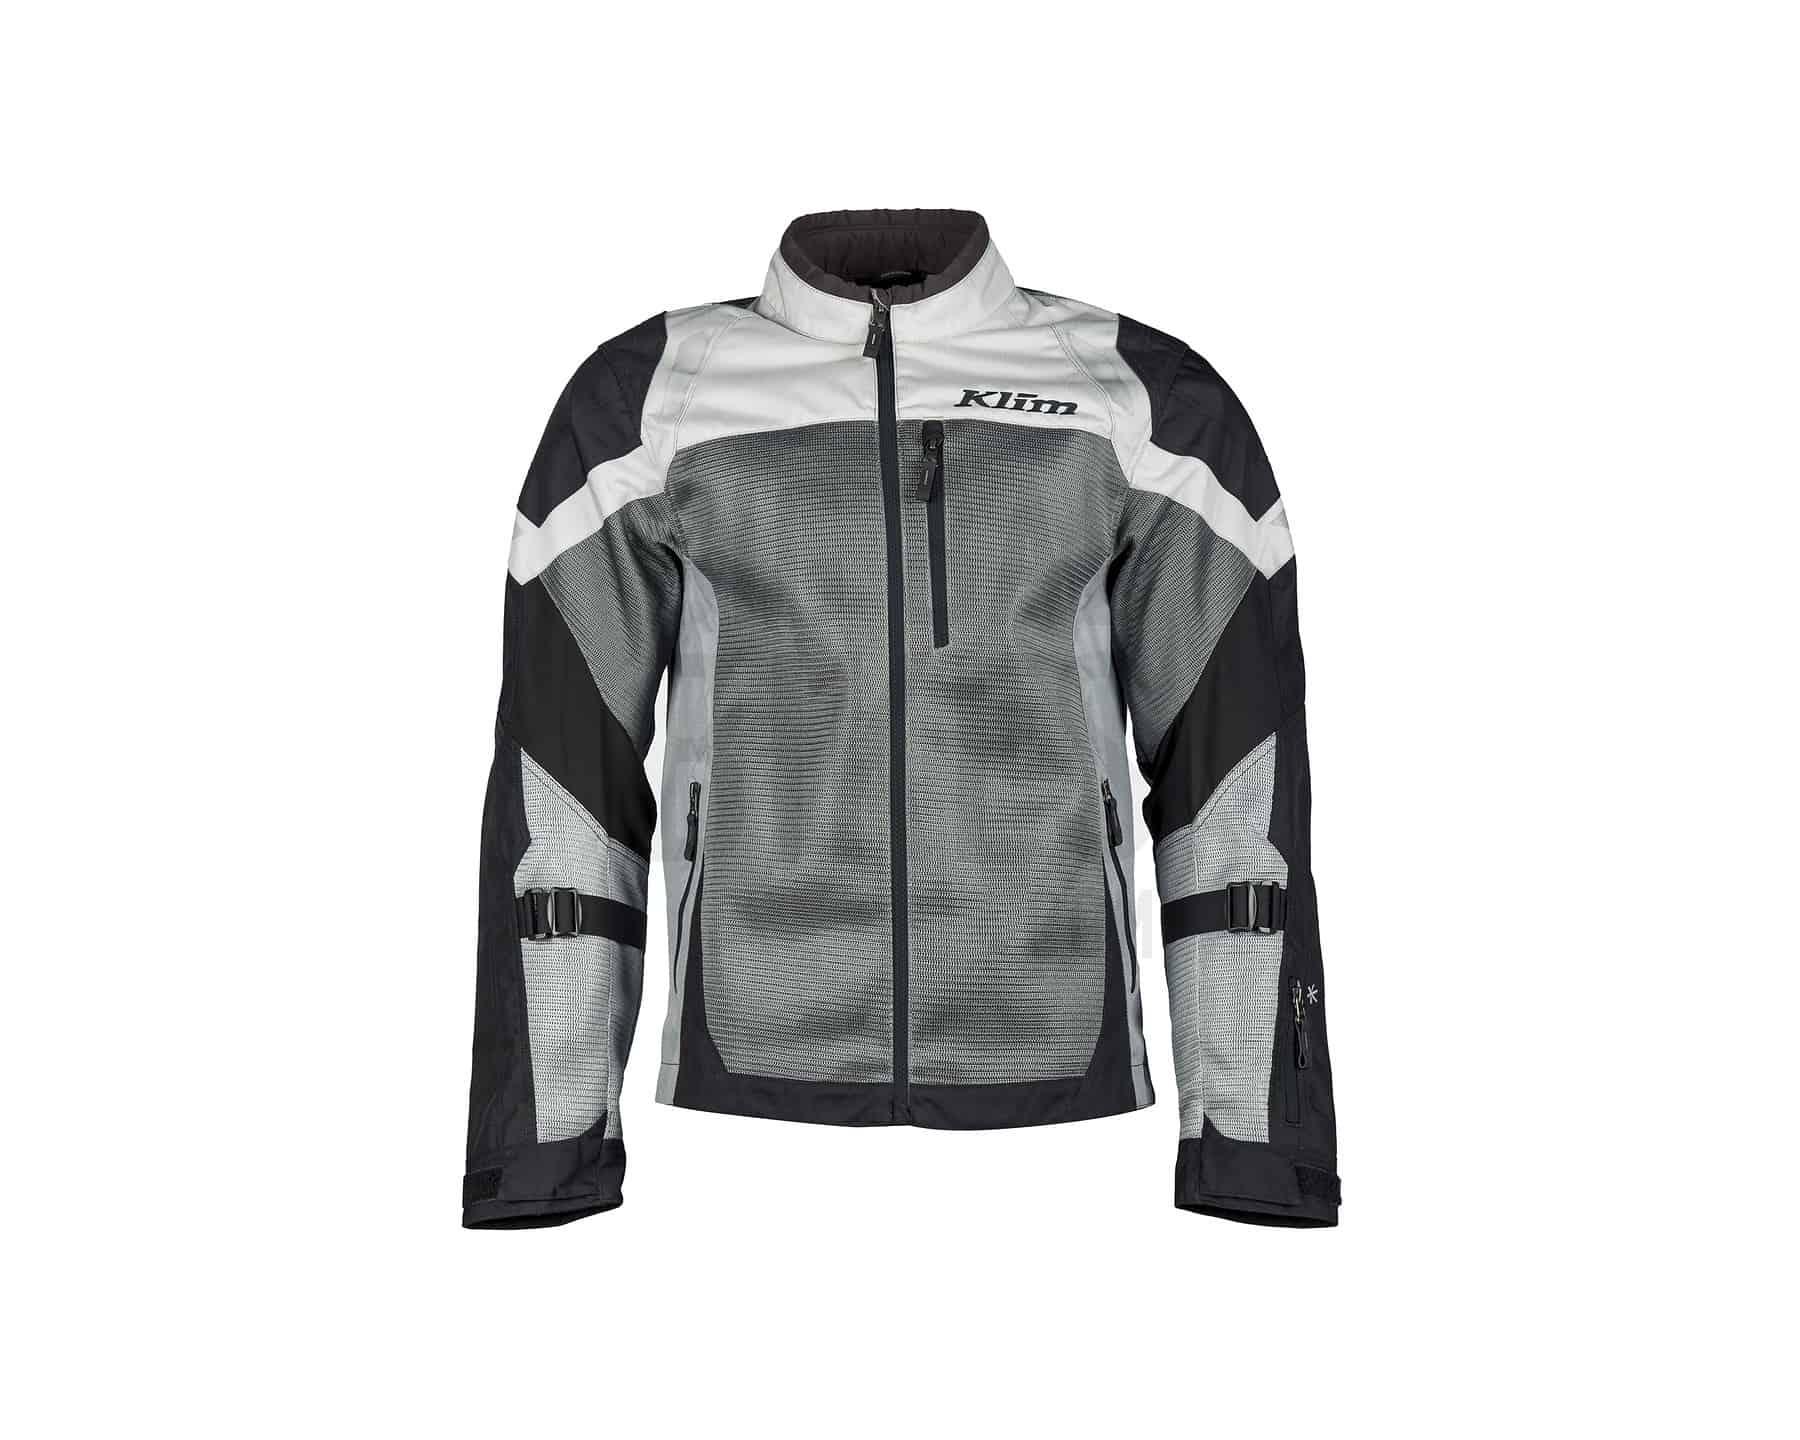 Induction Jacket_5060-002_Light Gray_01